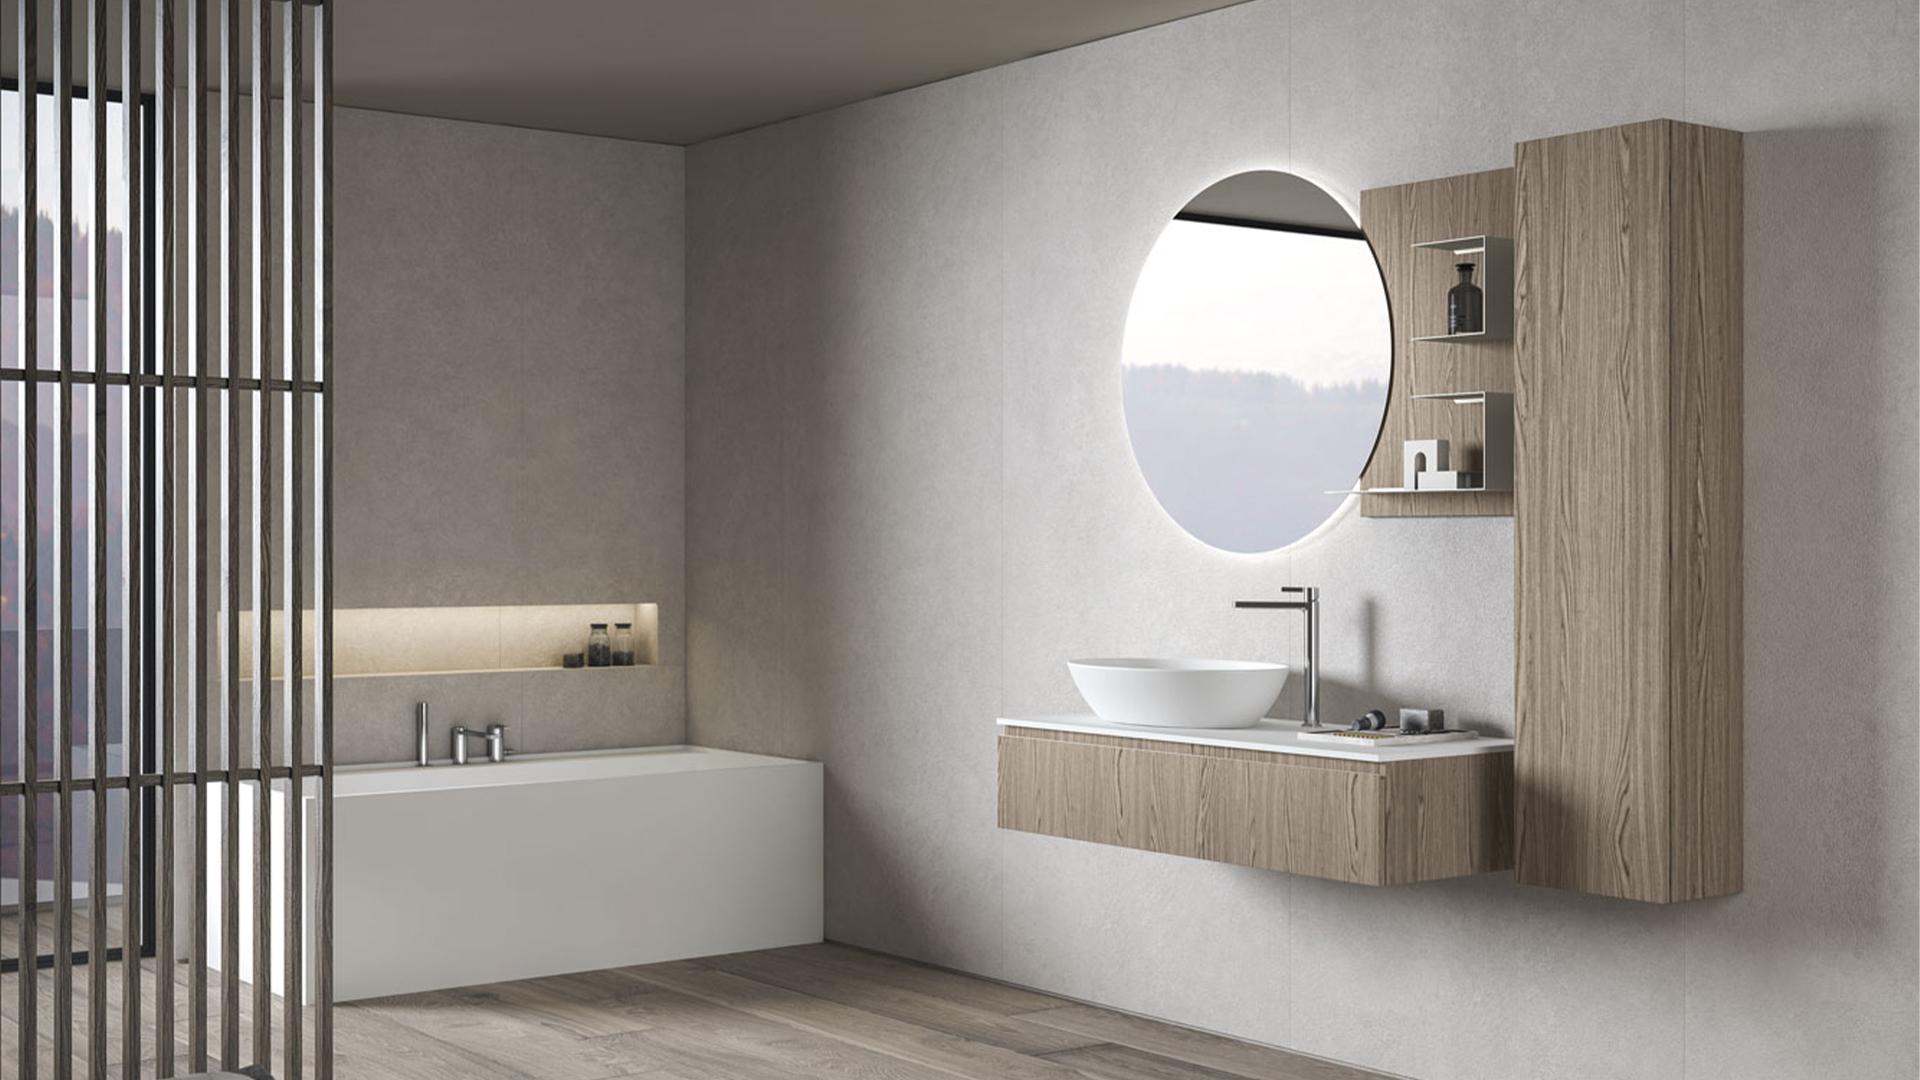 Slide salle de bains 9